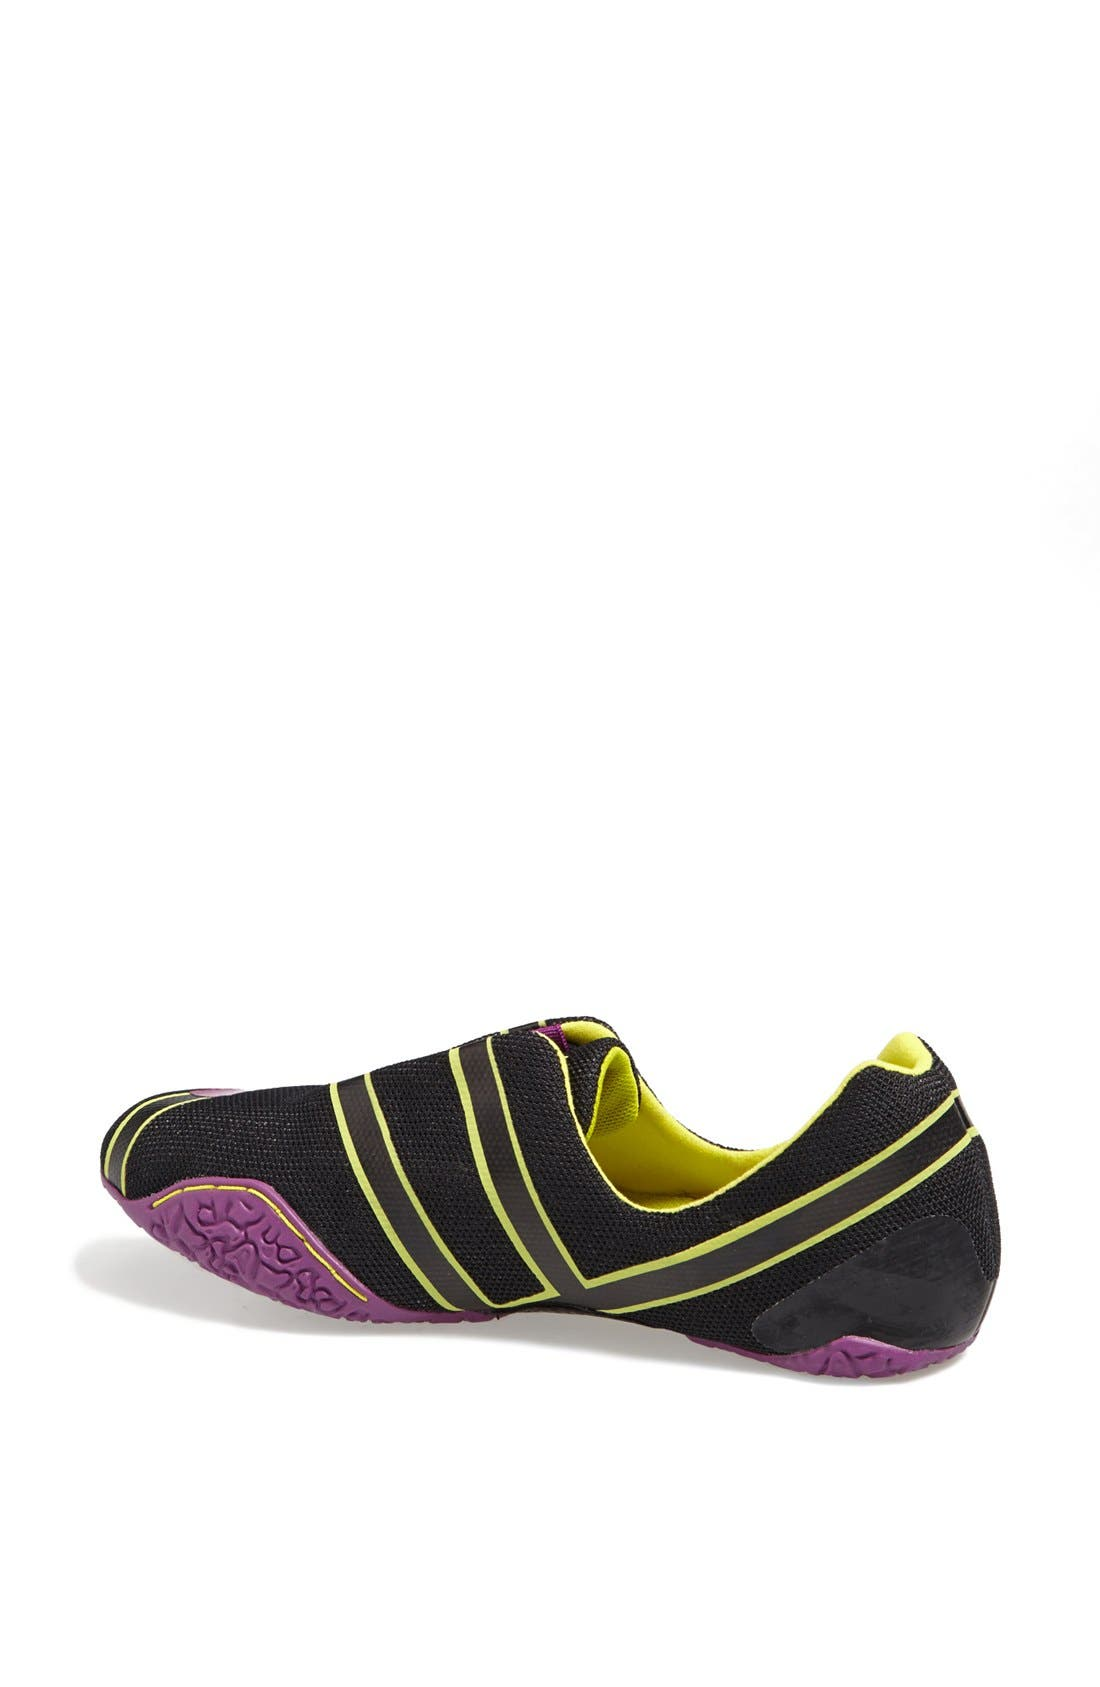 PUMA, 'Anaida' Foldable Sneaker, Alternate thumbnail 3, color, 001